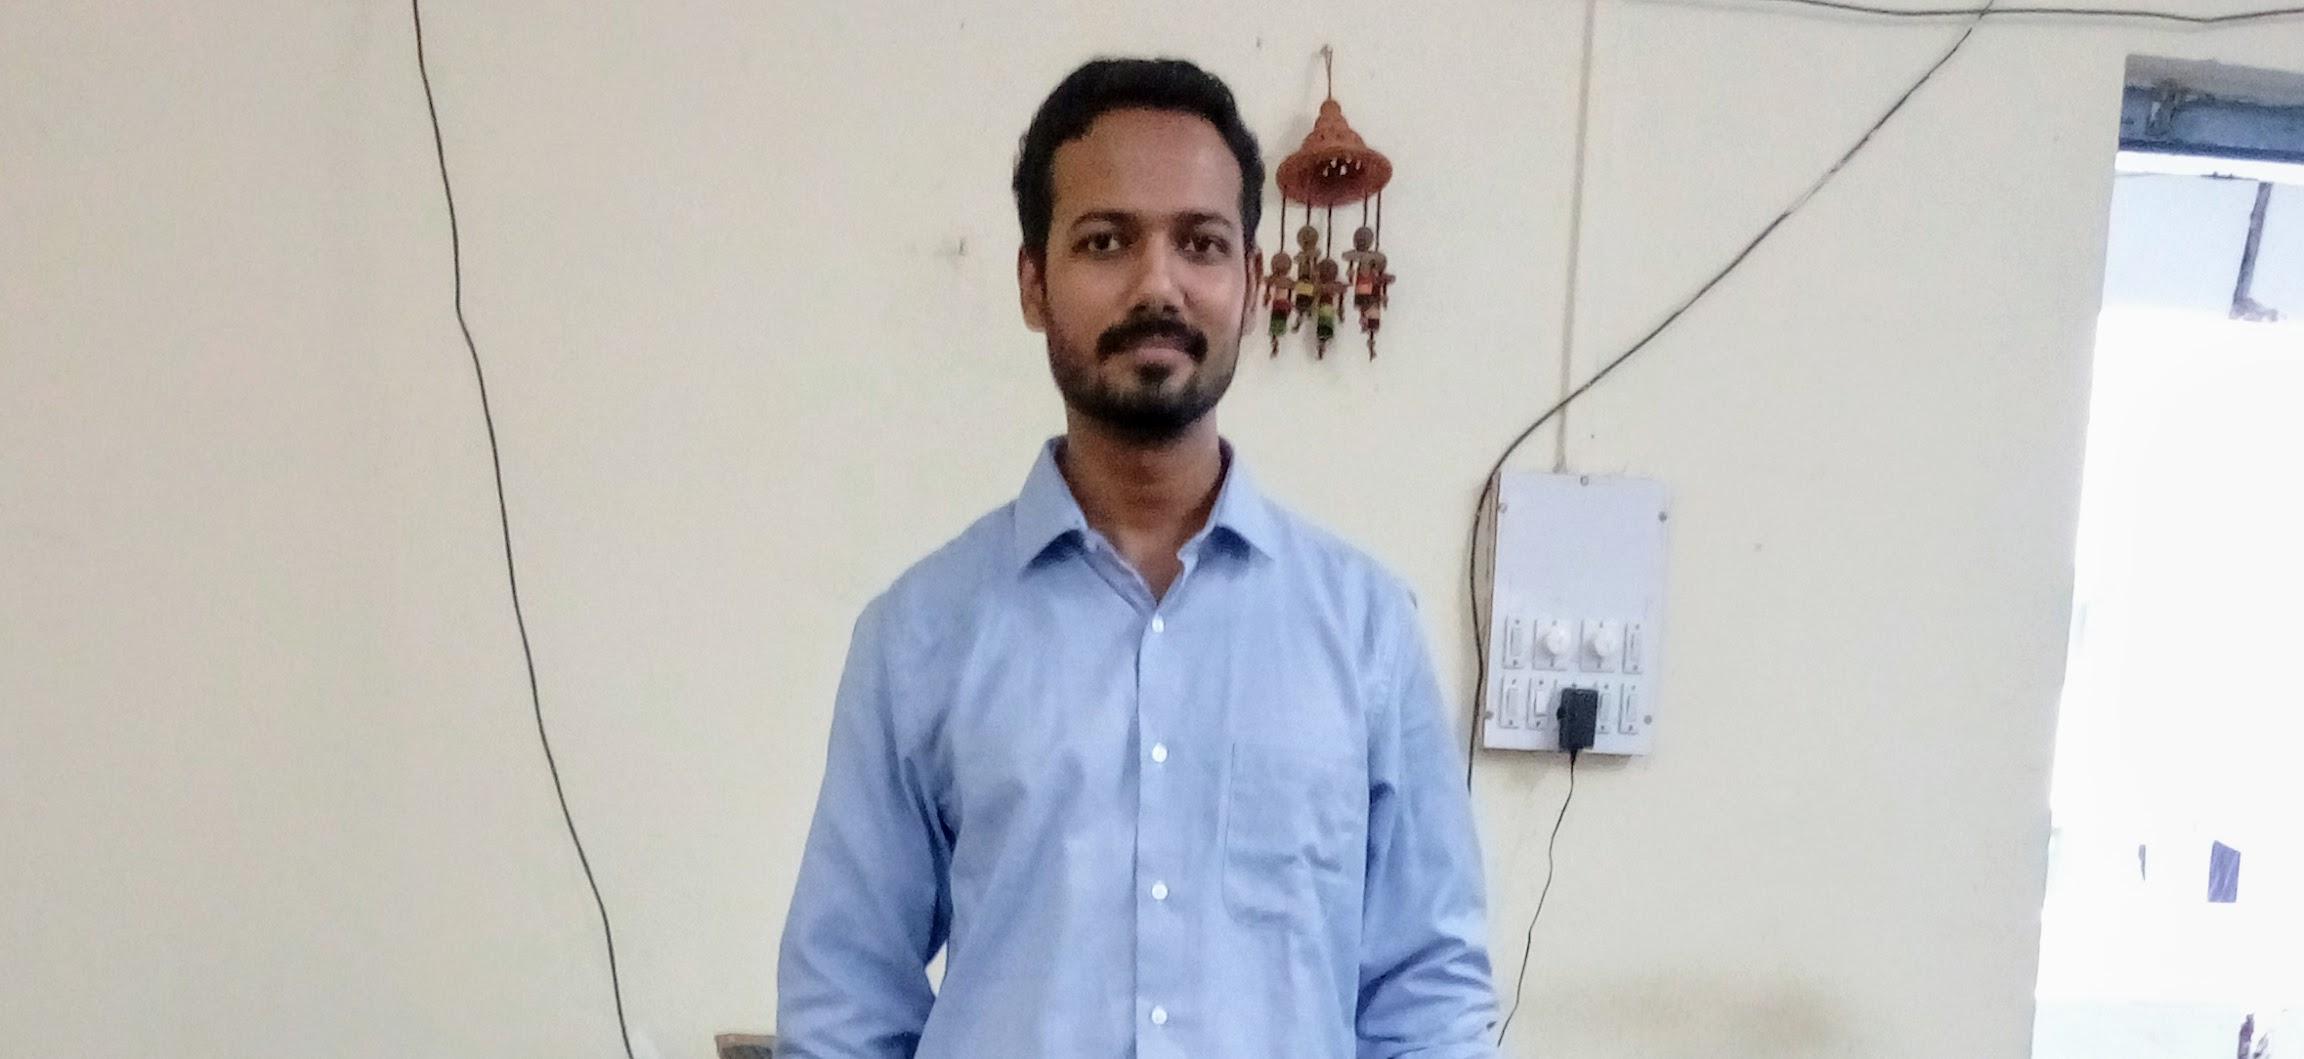 Prashant Singh profile image